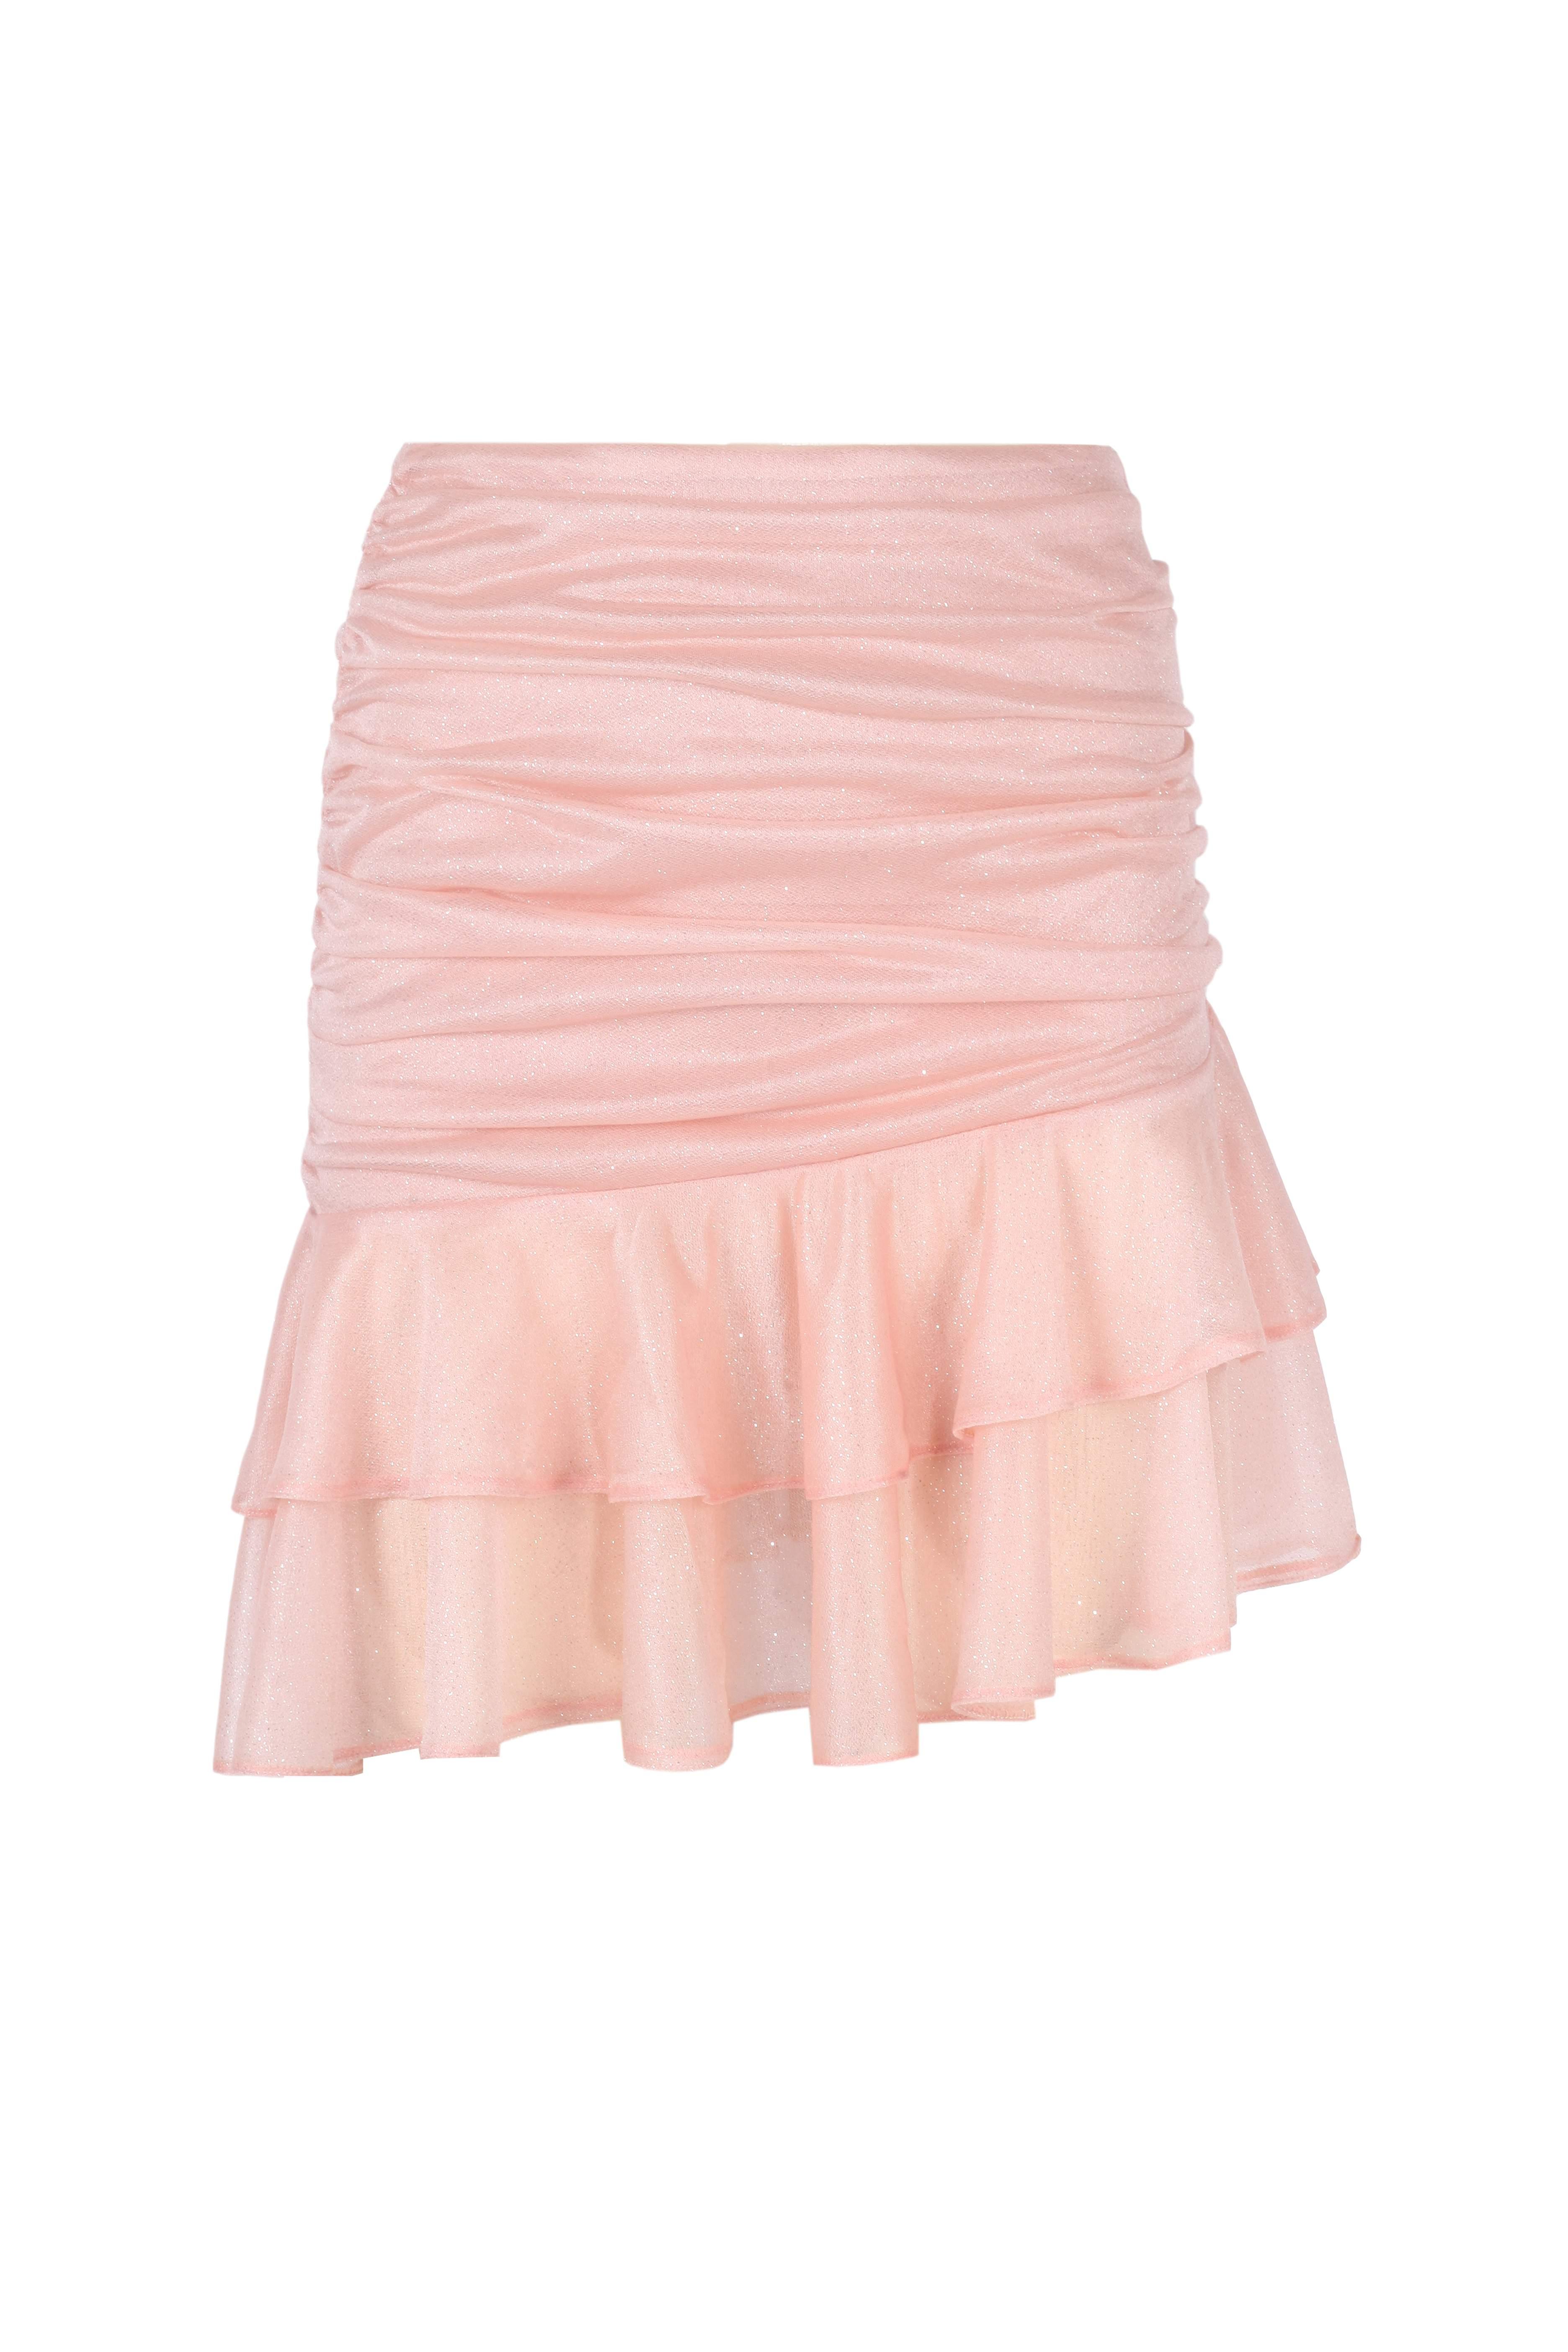 Dreamy Glitter Skirt